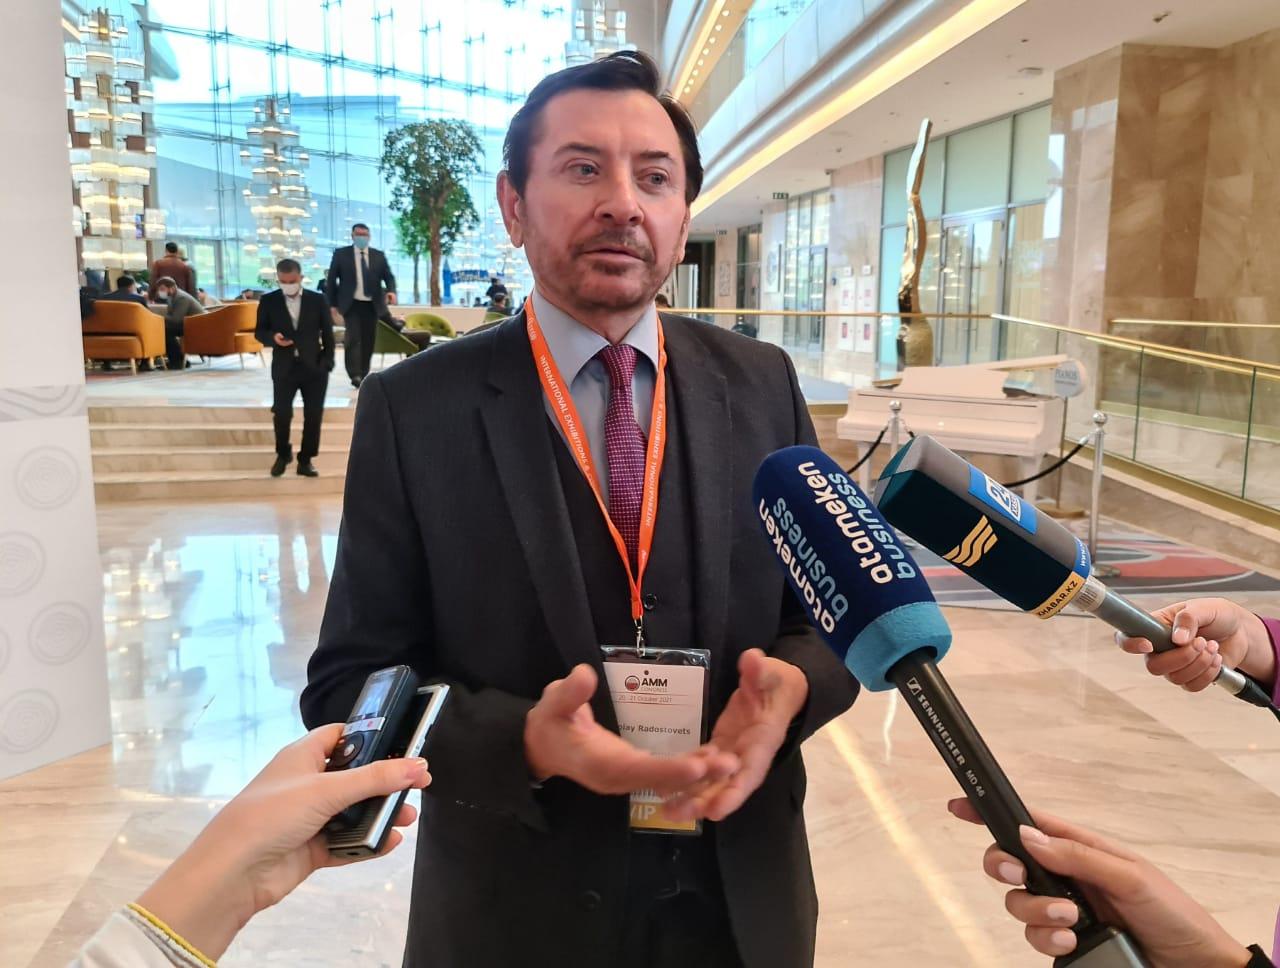 Николай Радостовец: «Қазақстан темір жолы» АҚ-ға реформа жүргізу қажет